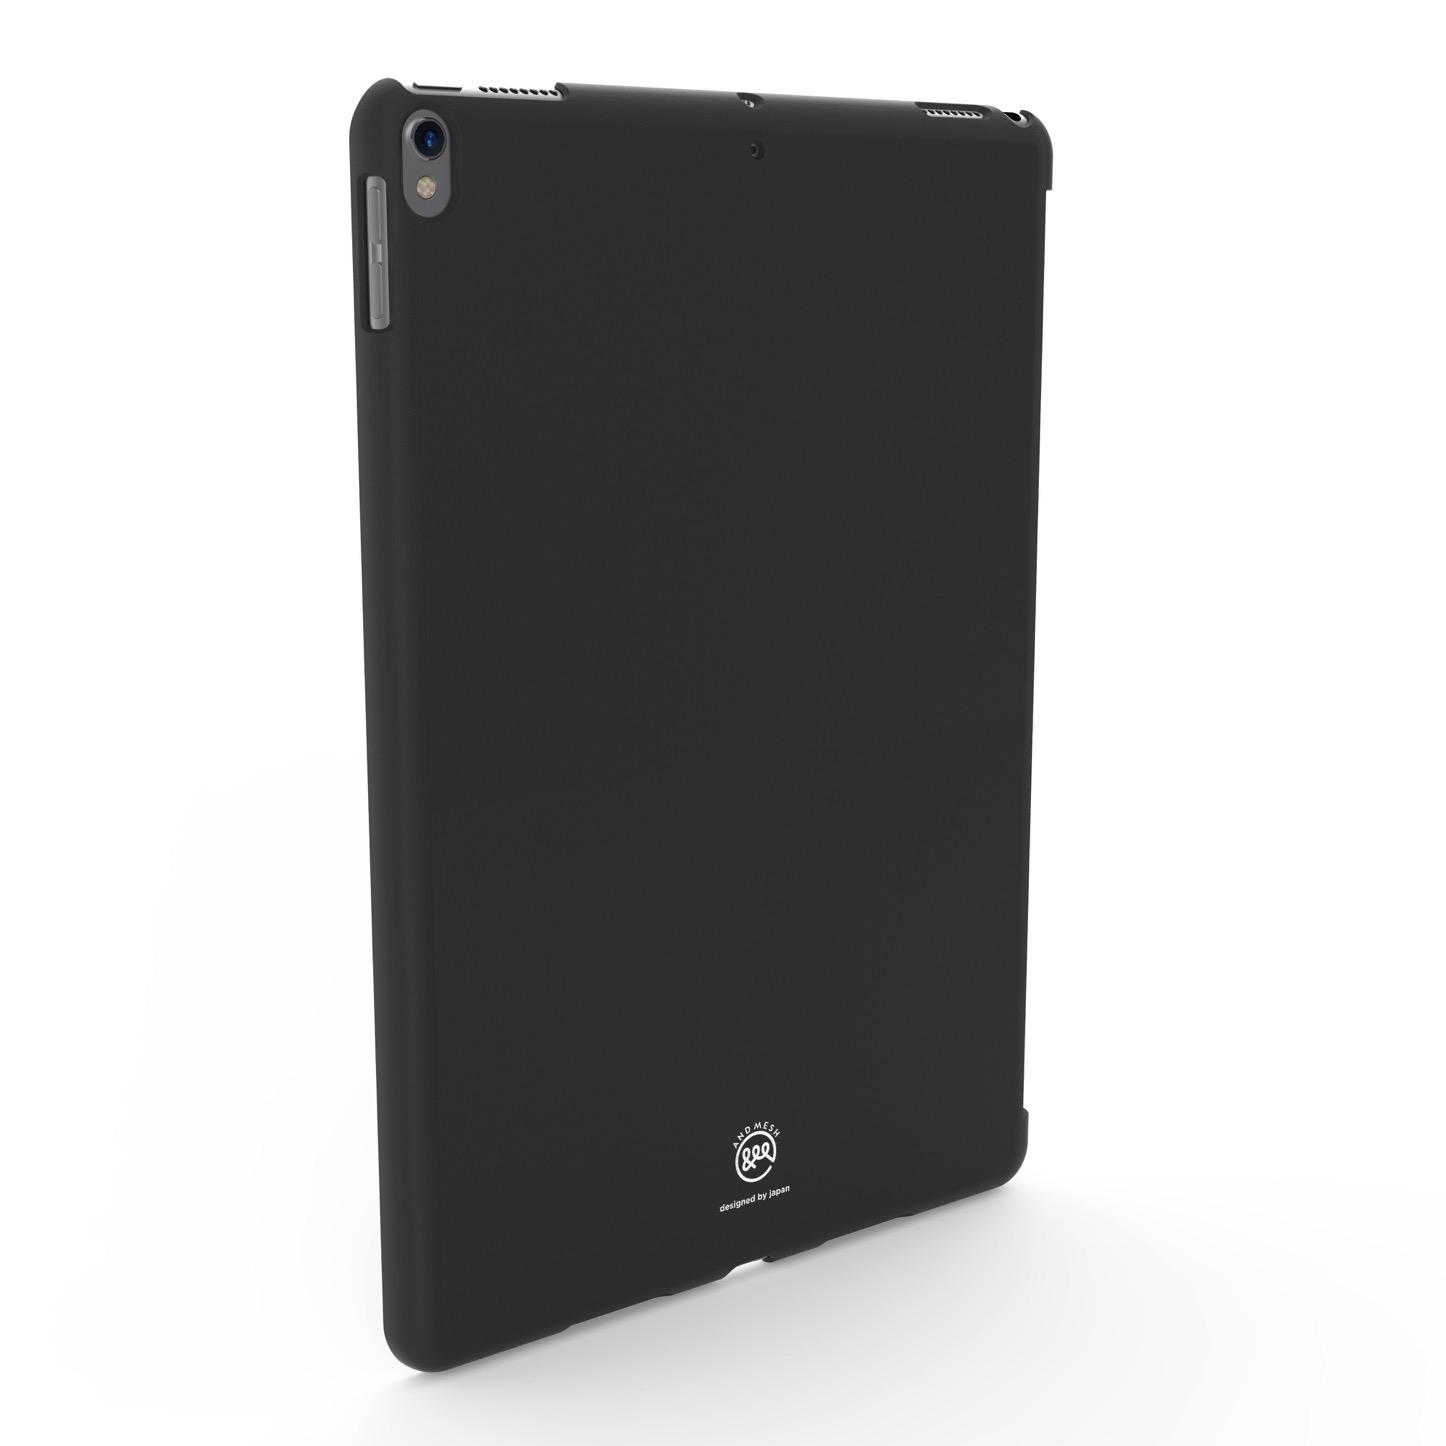 AndMesh-iPad-Pro-10_5-02.jpg